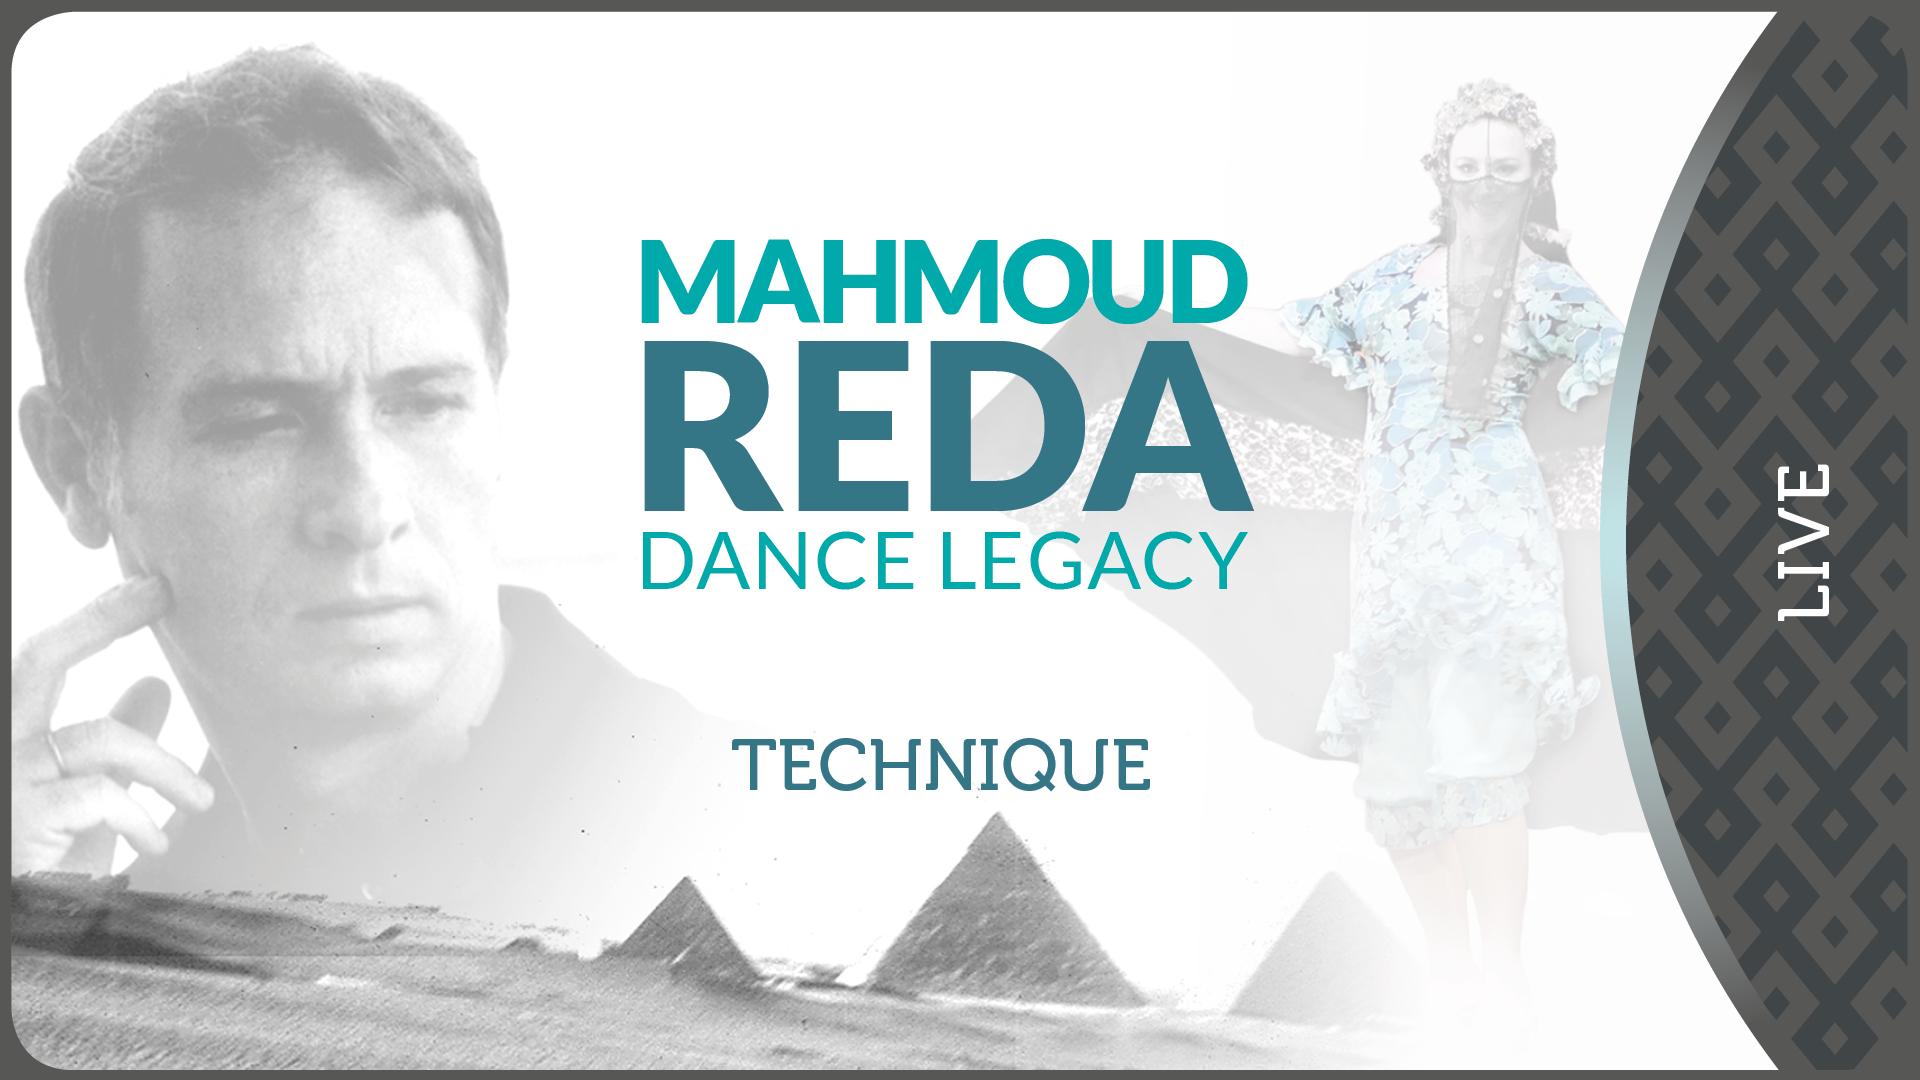 Mahmoud Reda Dance Legacy | Technique 9